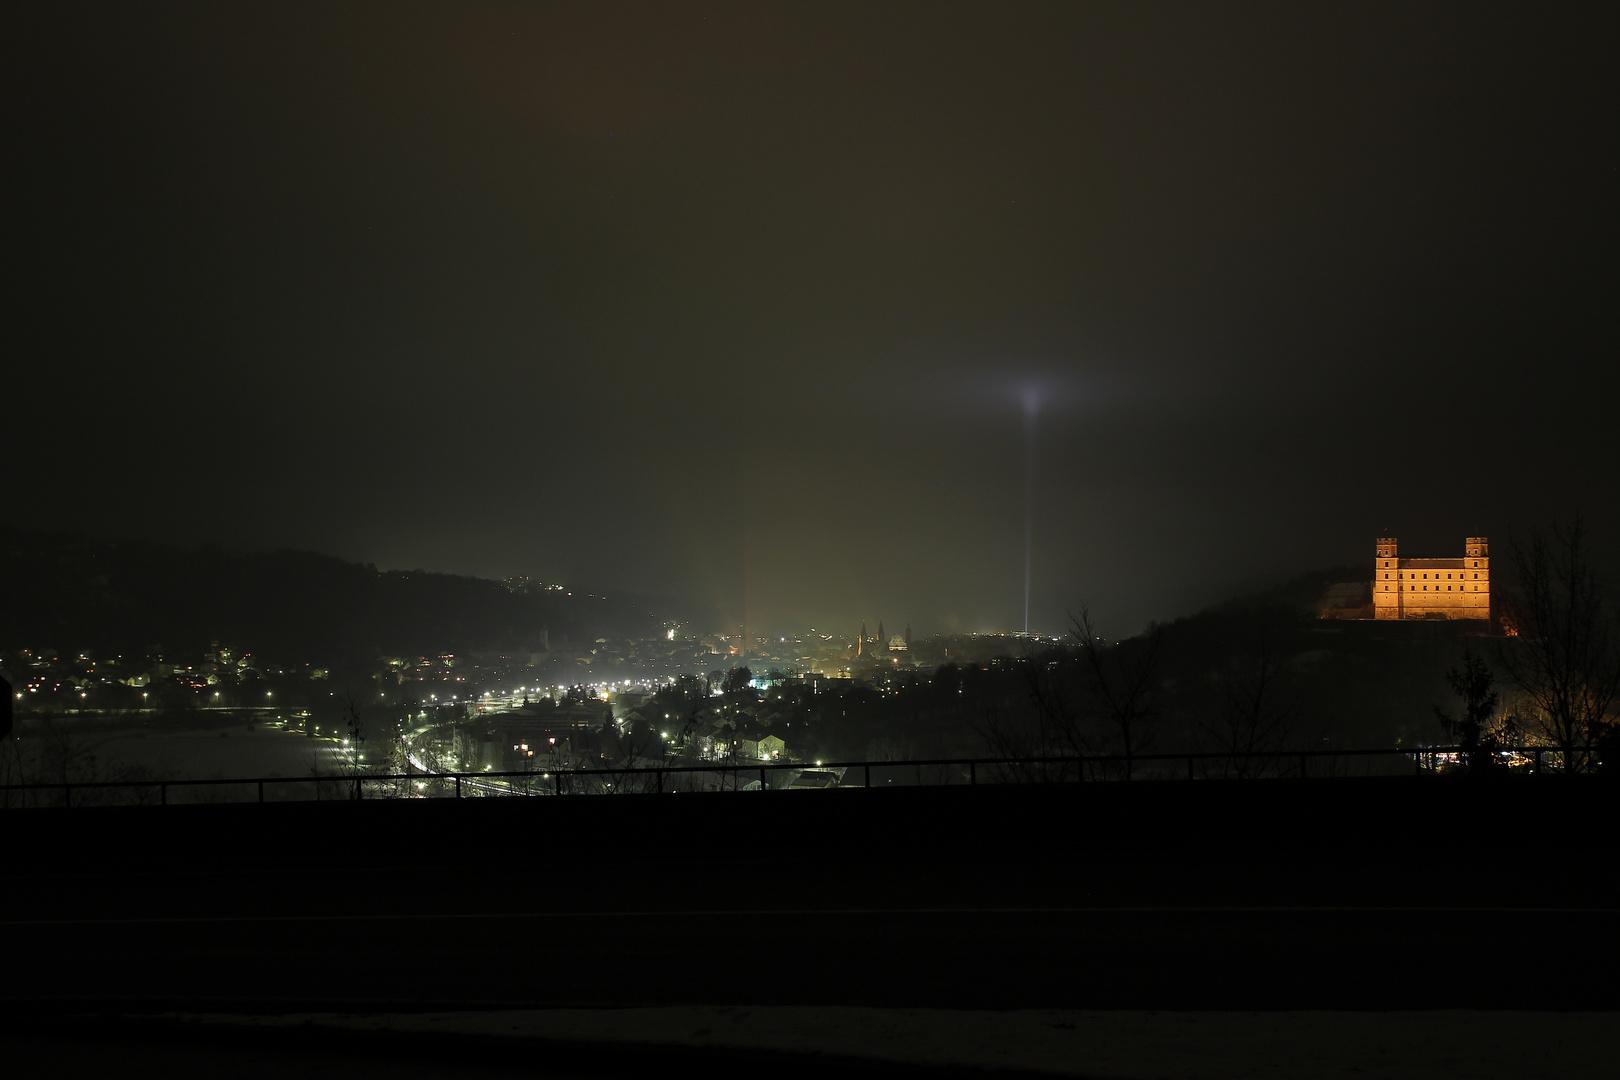 Osram Night in Eichstätt